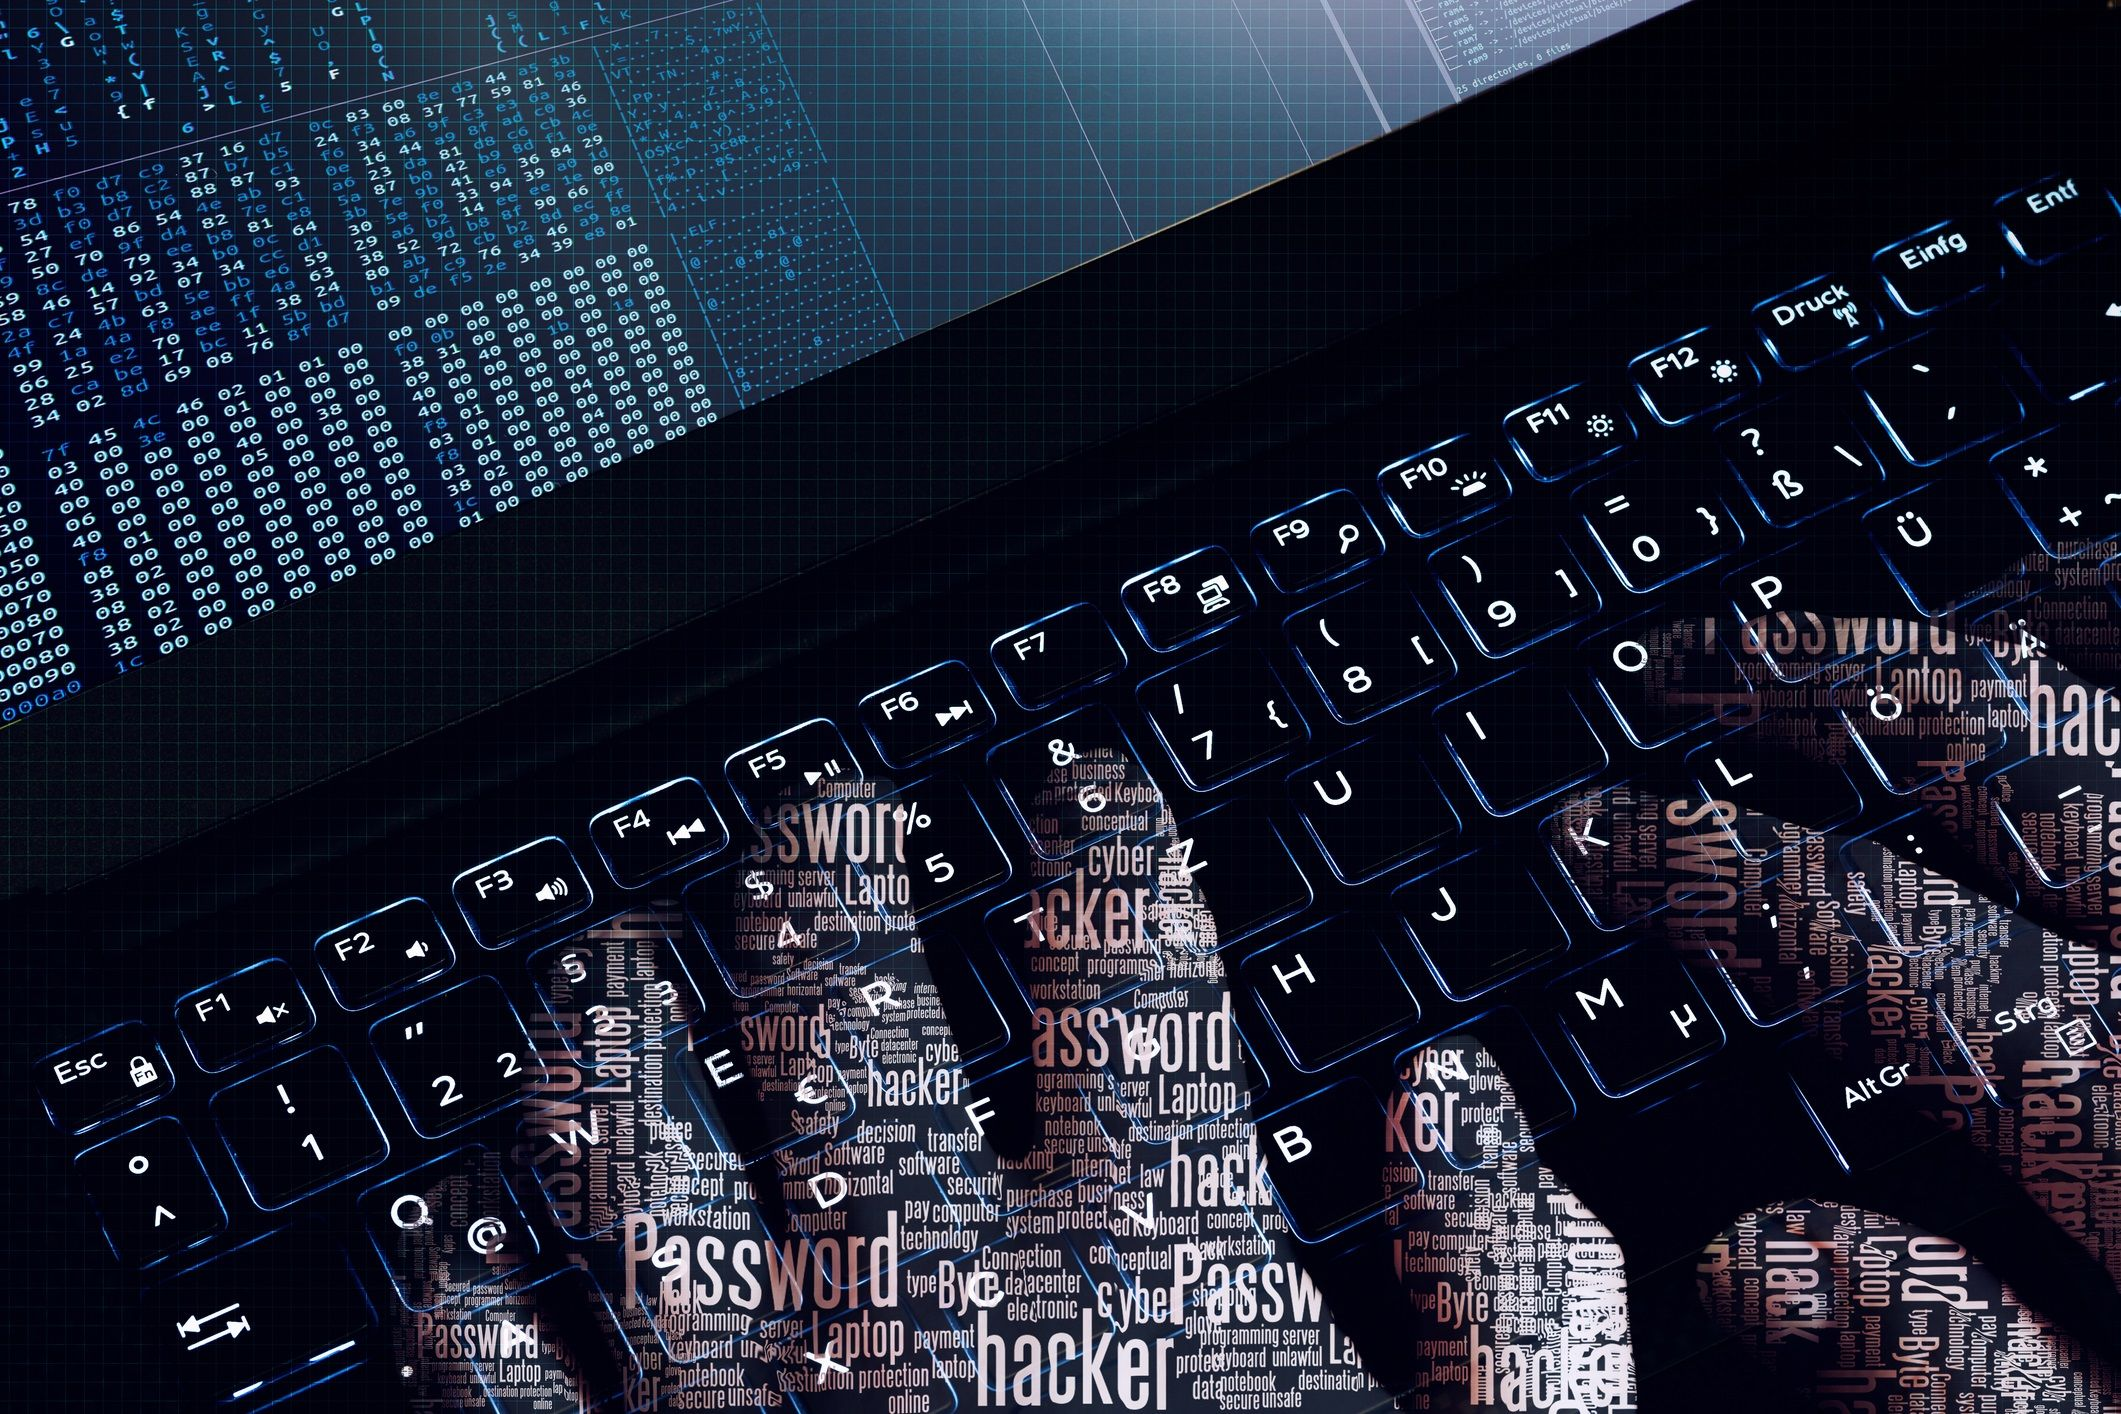 """wana decryptor""的图片搜索结果 Cyber attack, Business continuity"